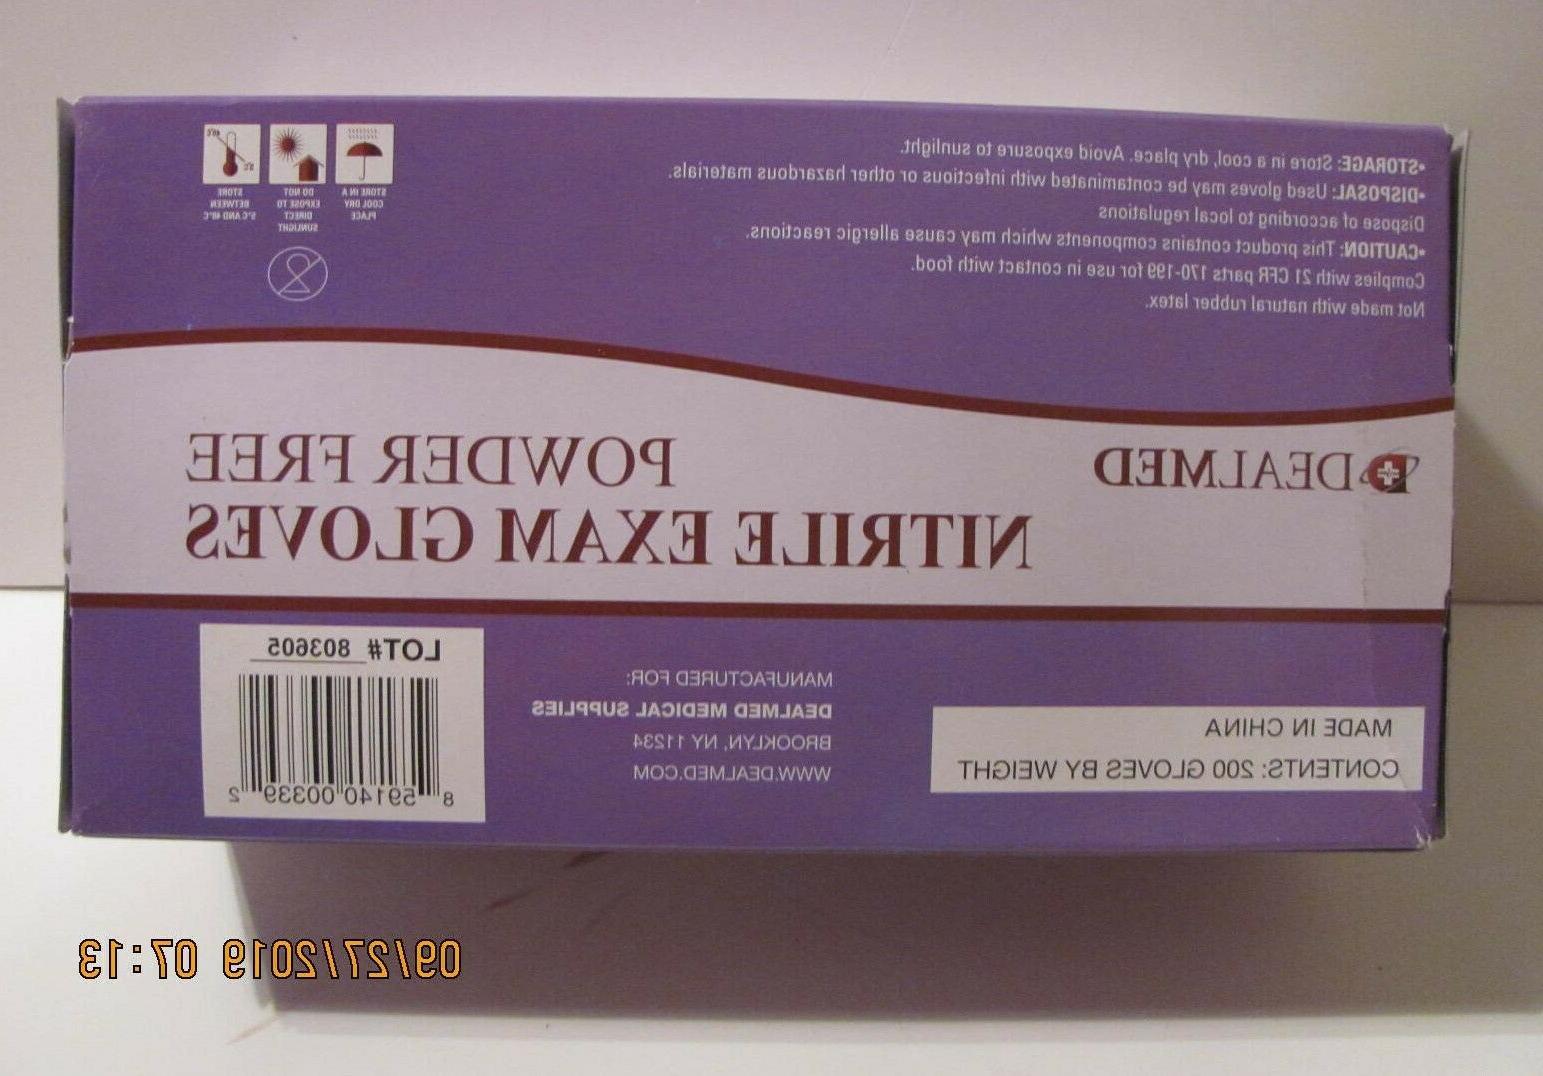 3-Pack Dealmed Nitrile Exam Gloves 200ct - Small